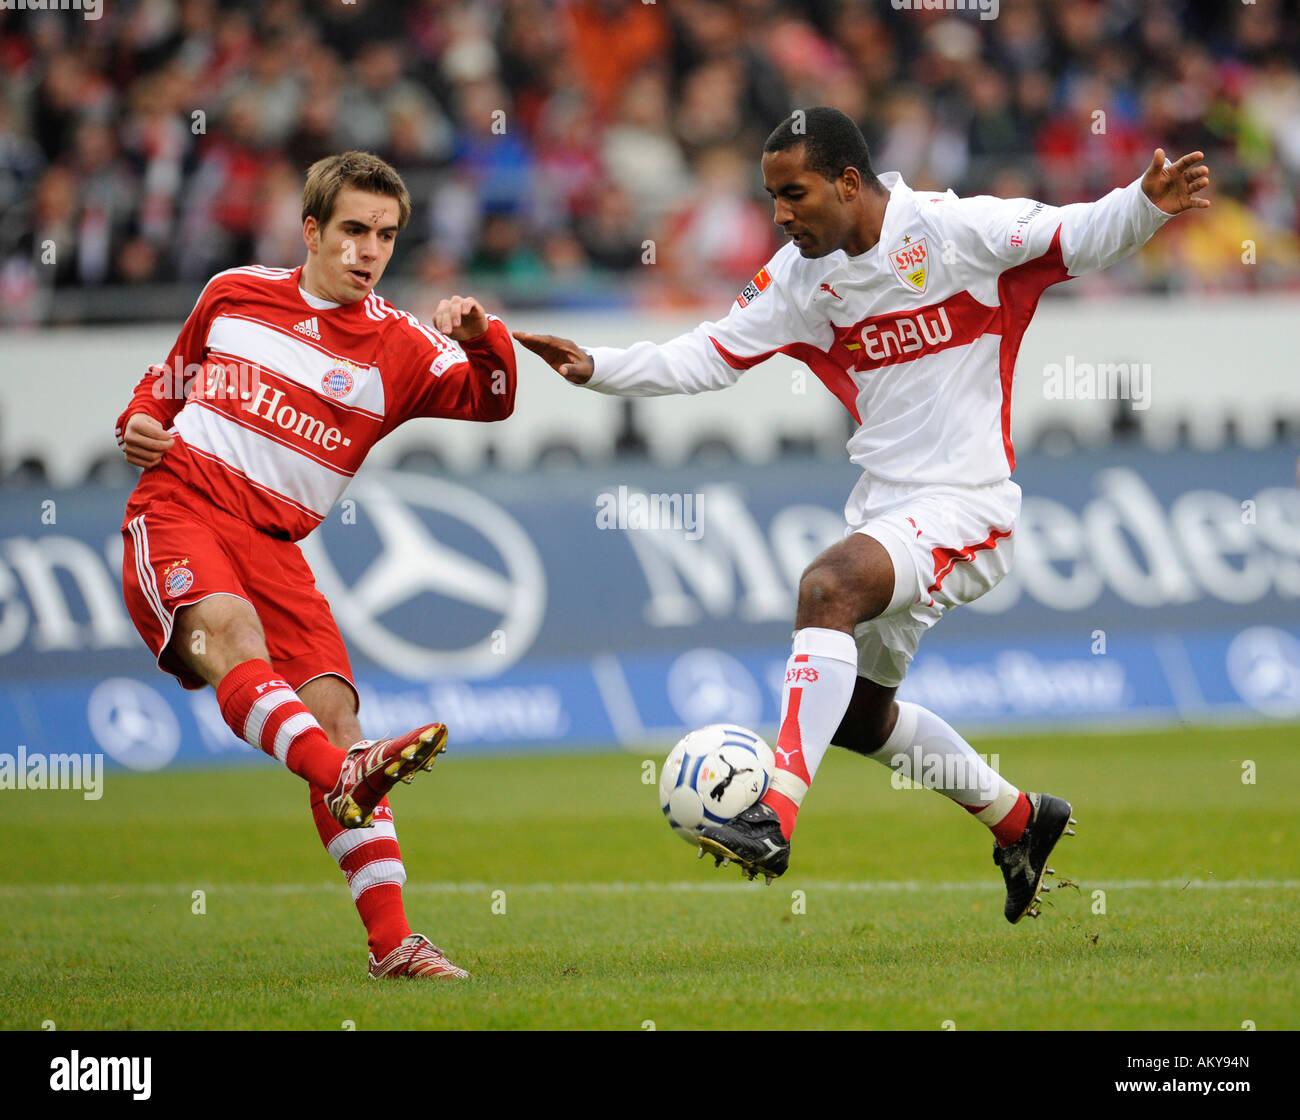 Philipp LAHM FC Bayern Muenchen left vs CACAU VfB Stuttgart